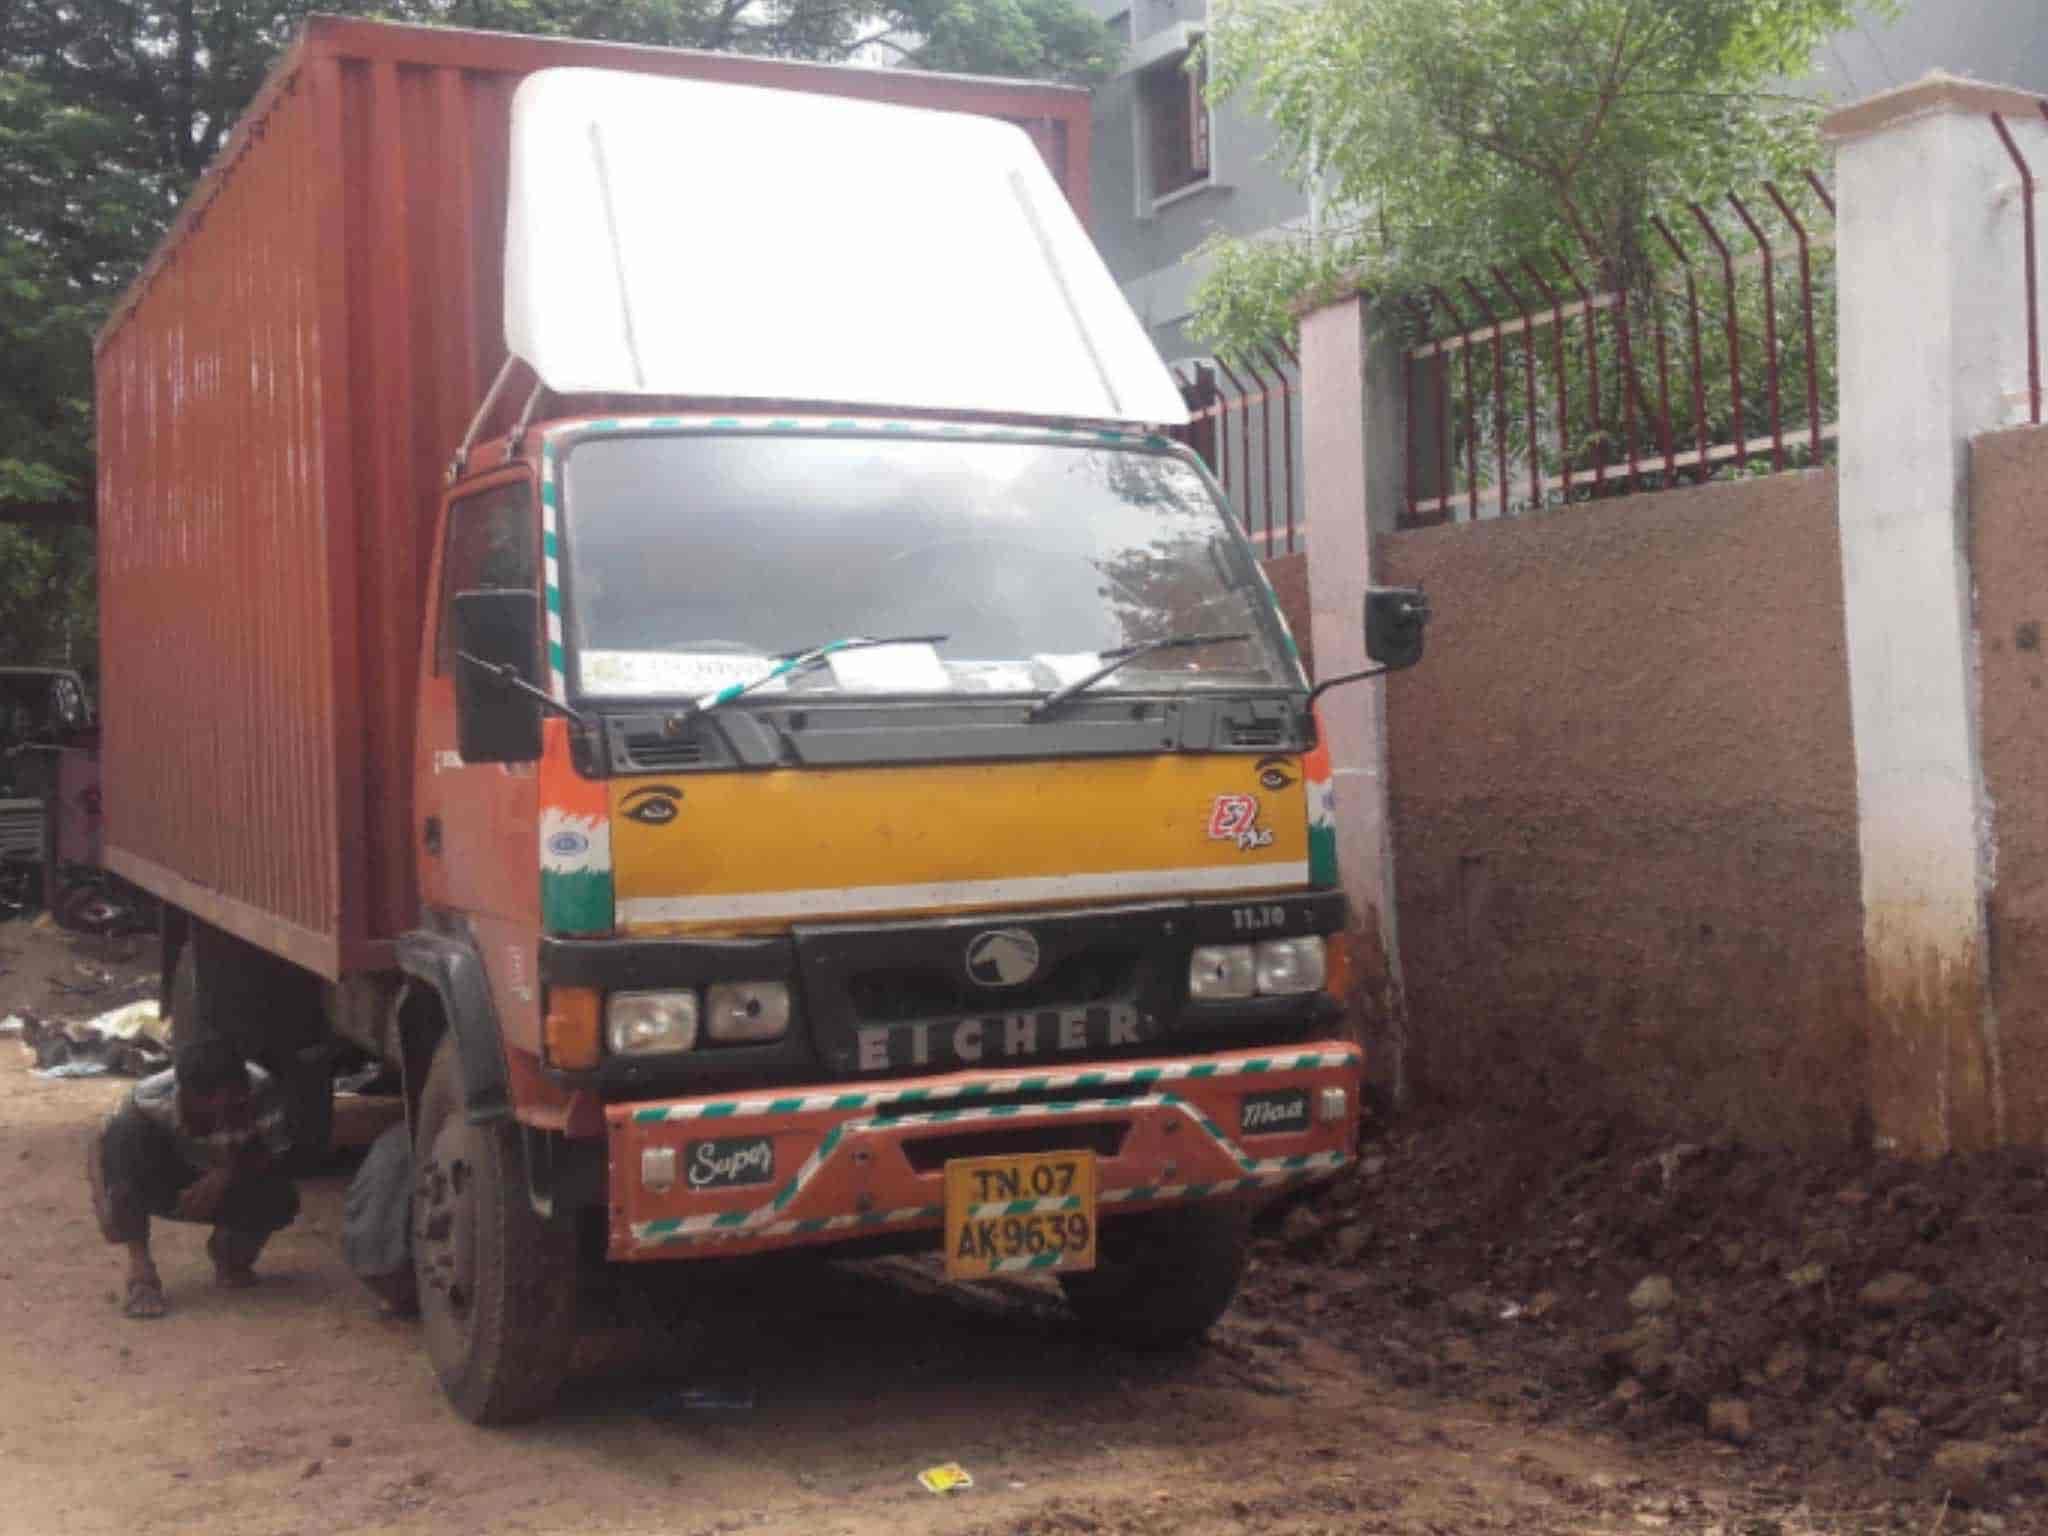 Top 100 Transporters In Chennai ���्रांसपोर्टर्स ���ेन्नई